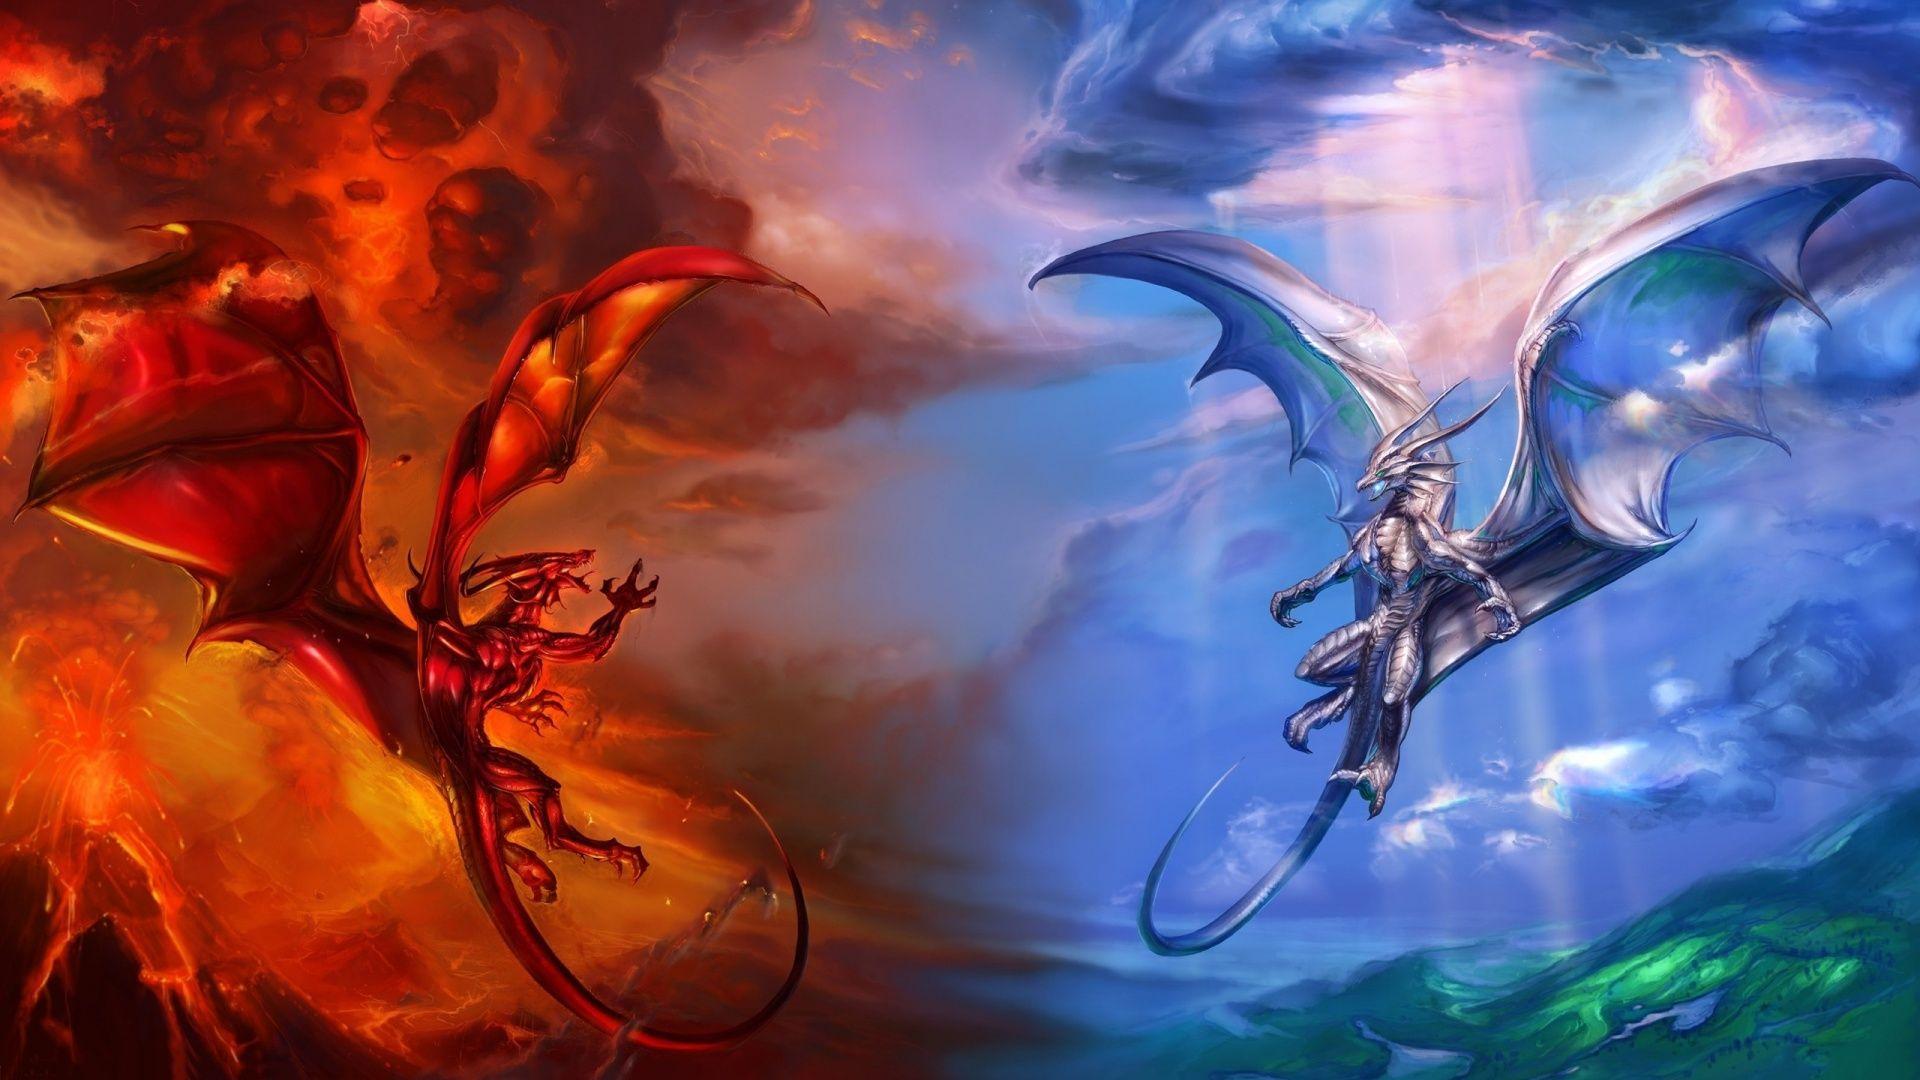 Download Blue Dragon Bleach Wallpaper 1680x1050 Full Hd Wallpapers In 2021 Cool Dragons Blue Dragon Dragon Pictures